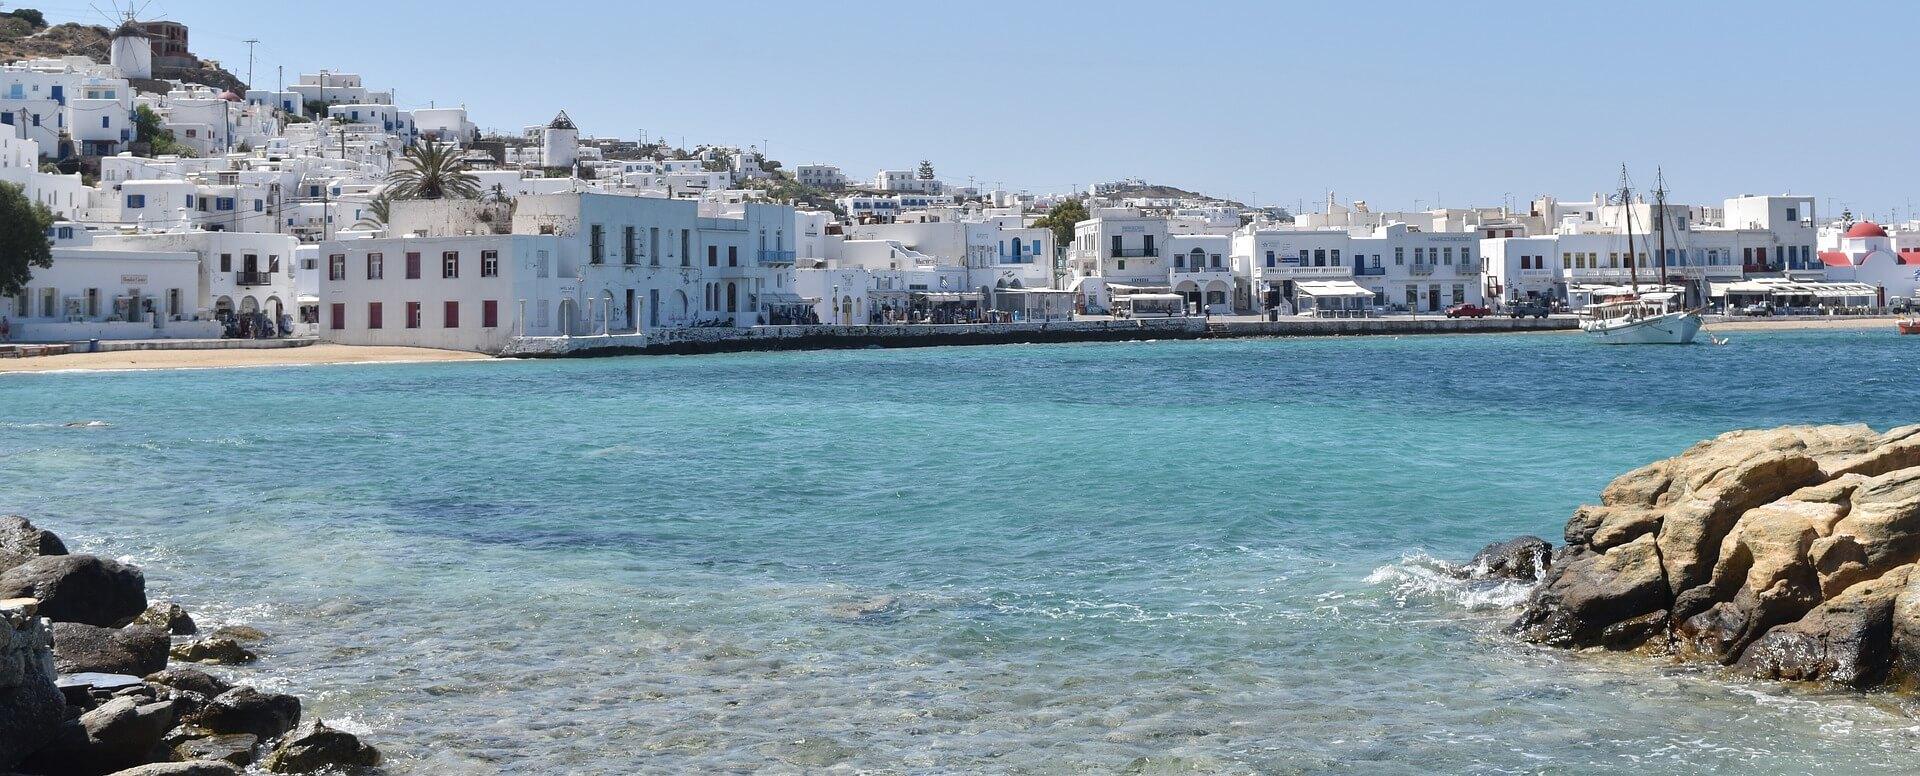 Les plages - Cyclades - Mykonos